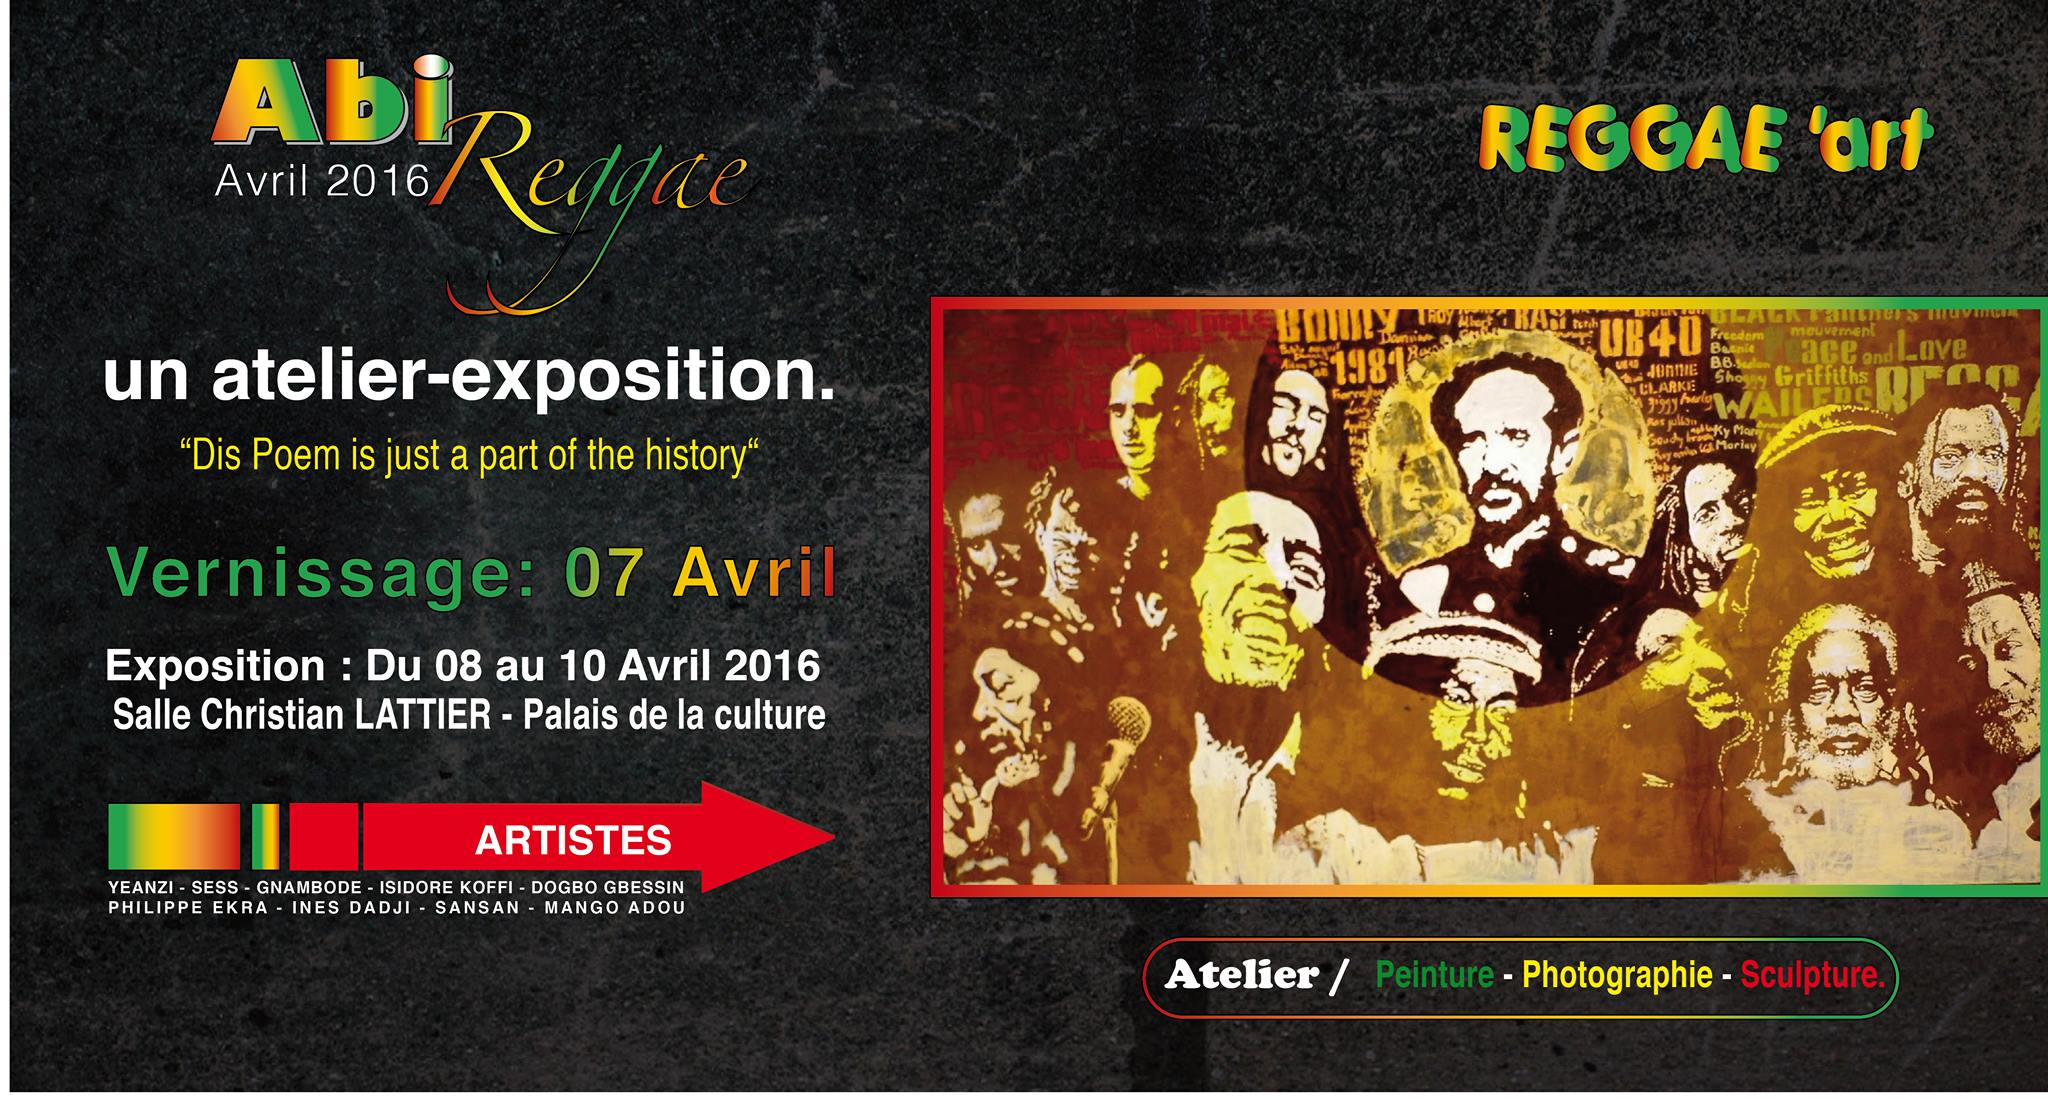 AbiReggae Art – Exposition d'arts visuels consacrée au Reggae et à la culture Rastafari